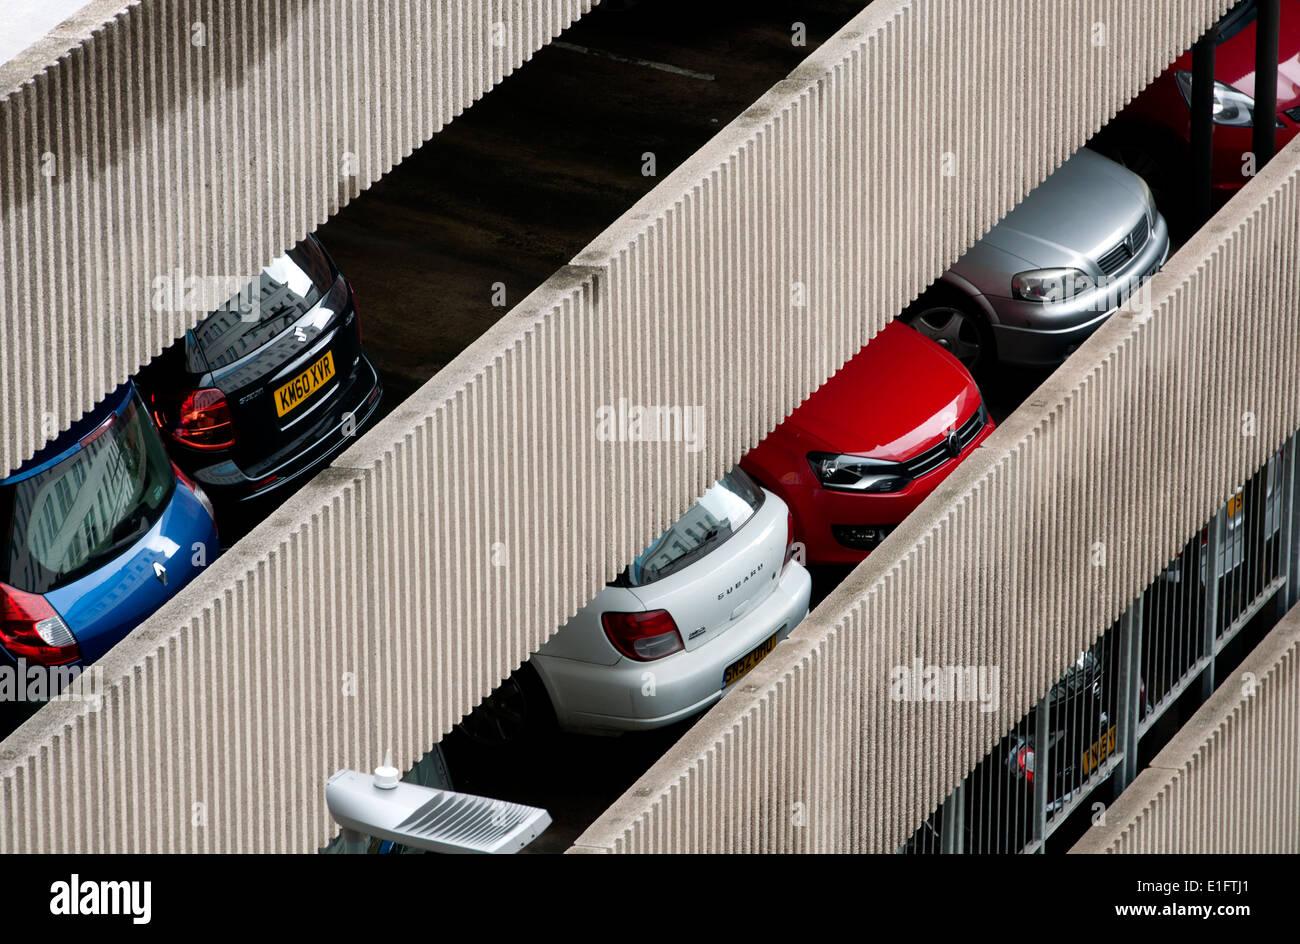 Multistorey car park, Birmingham city centre, UK - Stock Image